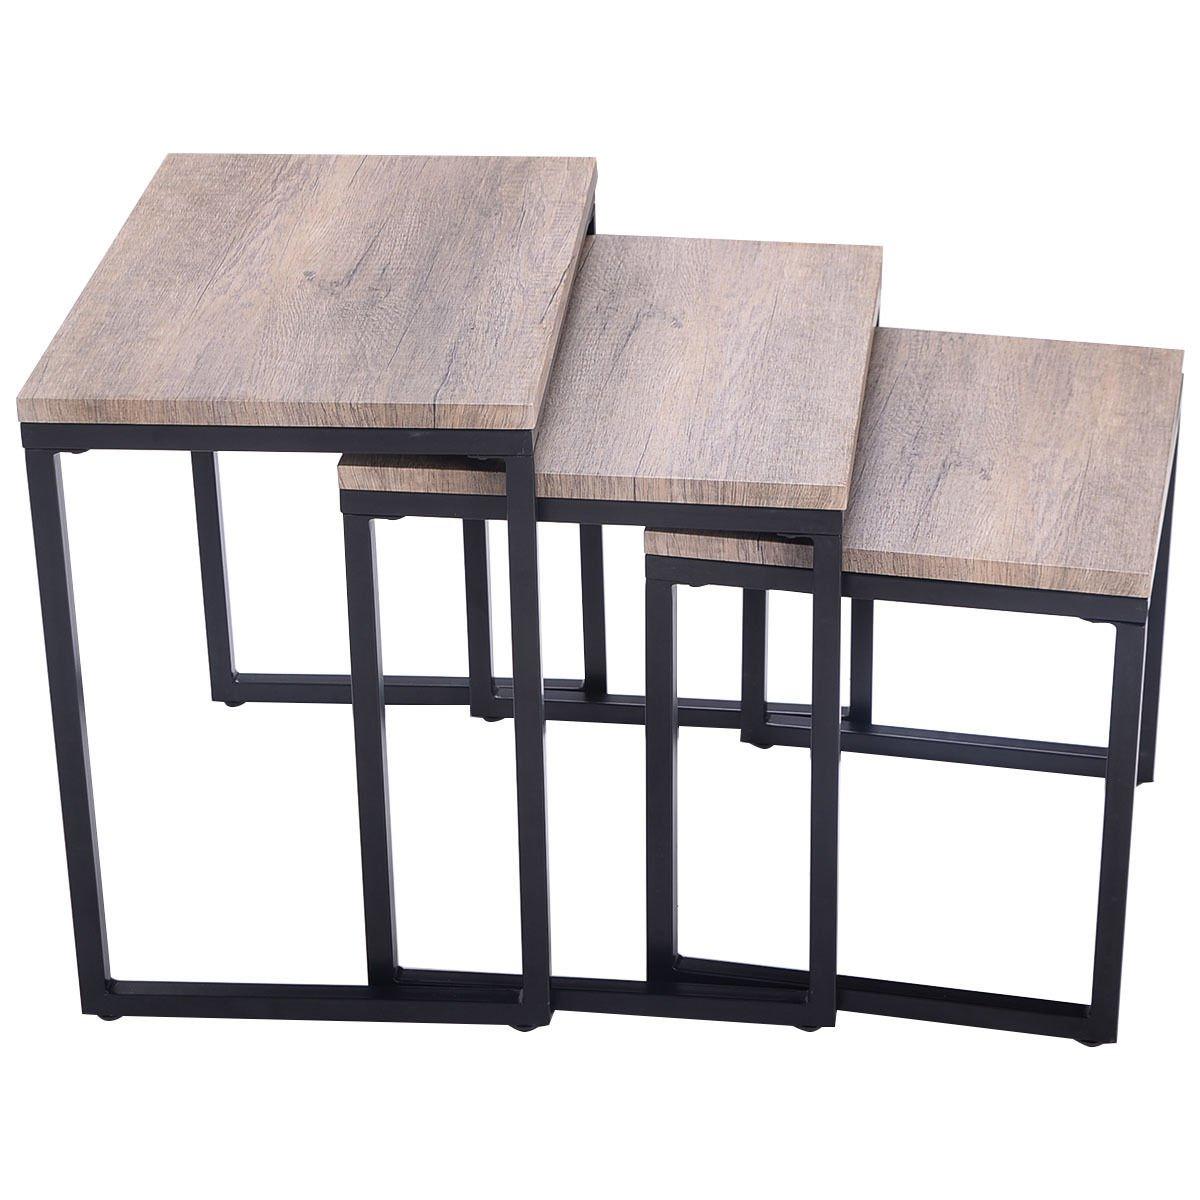 Amazon.com: Giantex 3PC Stacking Nesting Coffee End Table Set Living ...